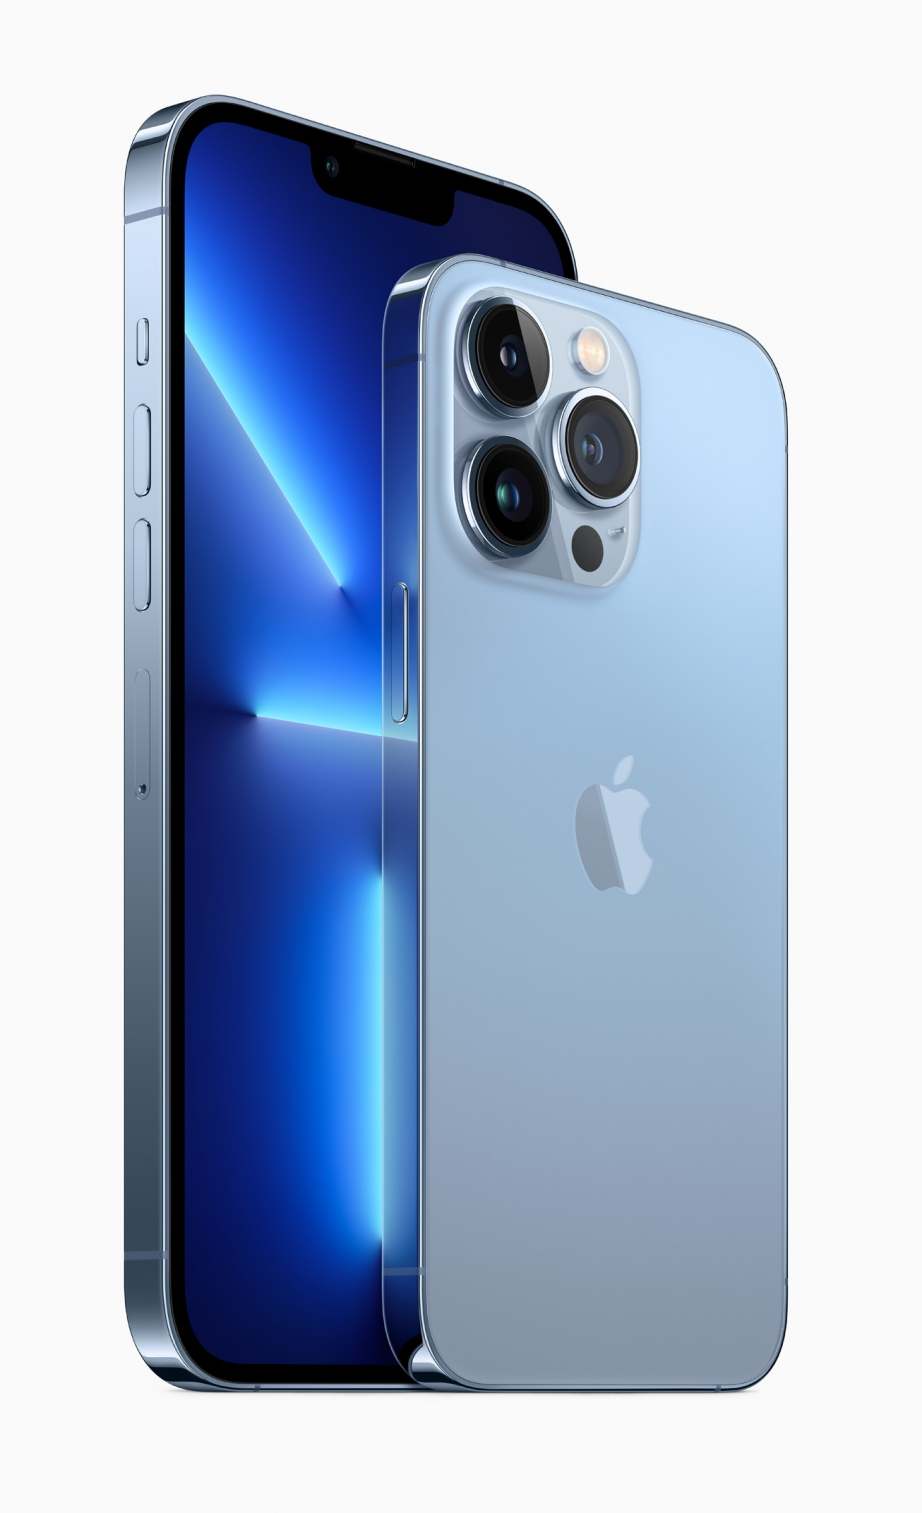 Apple_iPhone-13-Pro_iPhone-13-Pro-Max_GEO_09142021.jpg